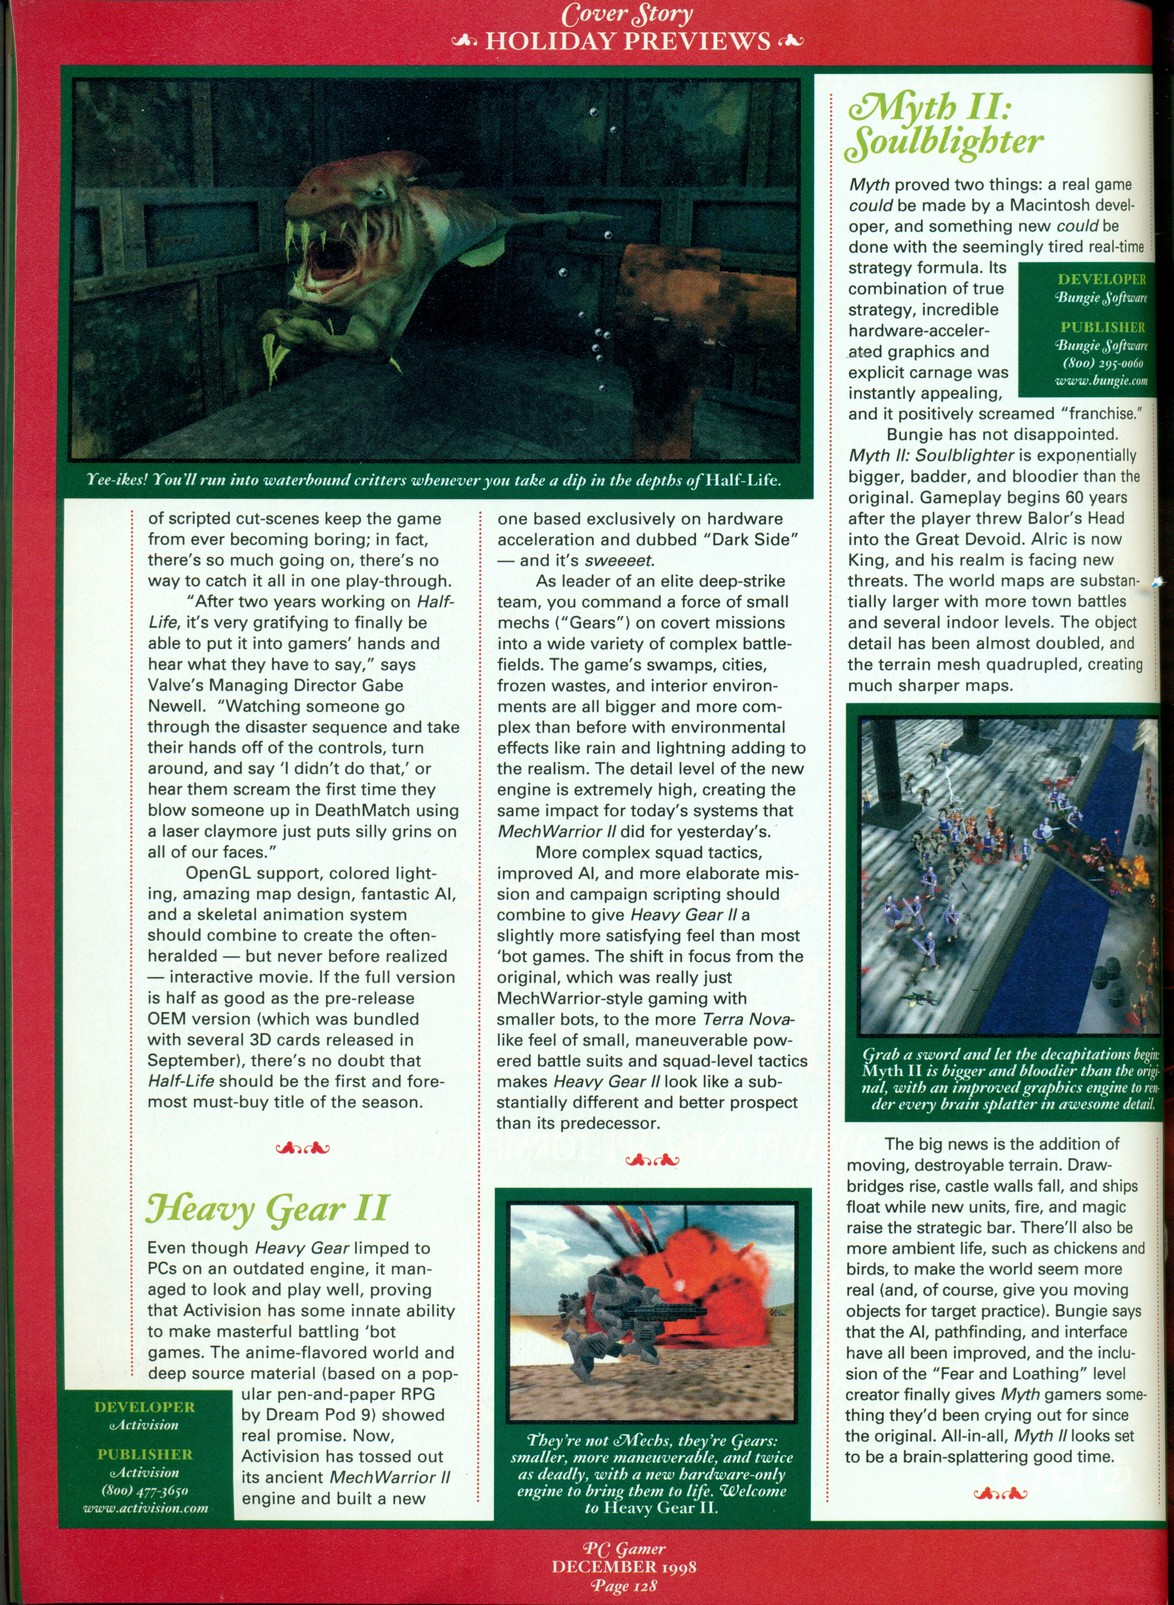 PCGamer_December1998_HalfLife2